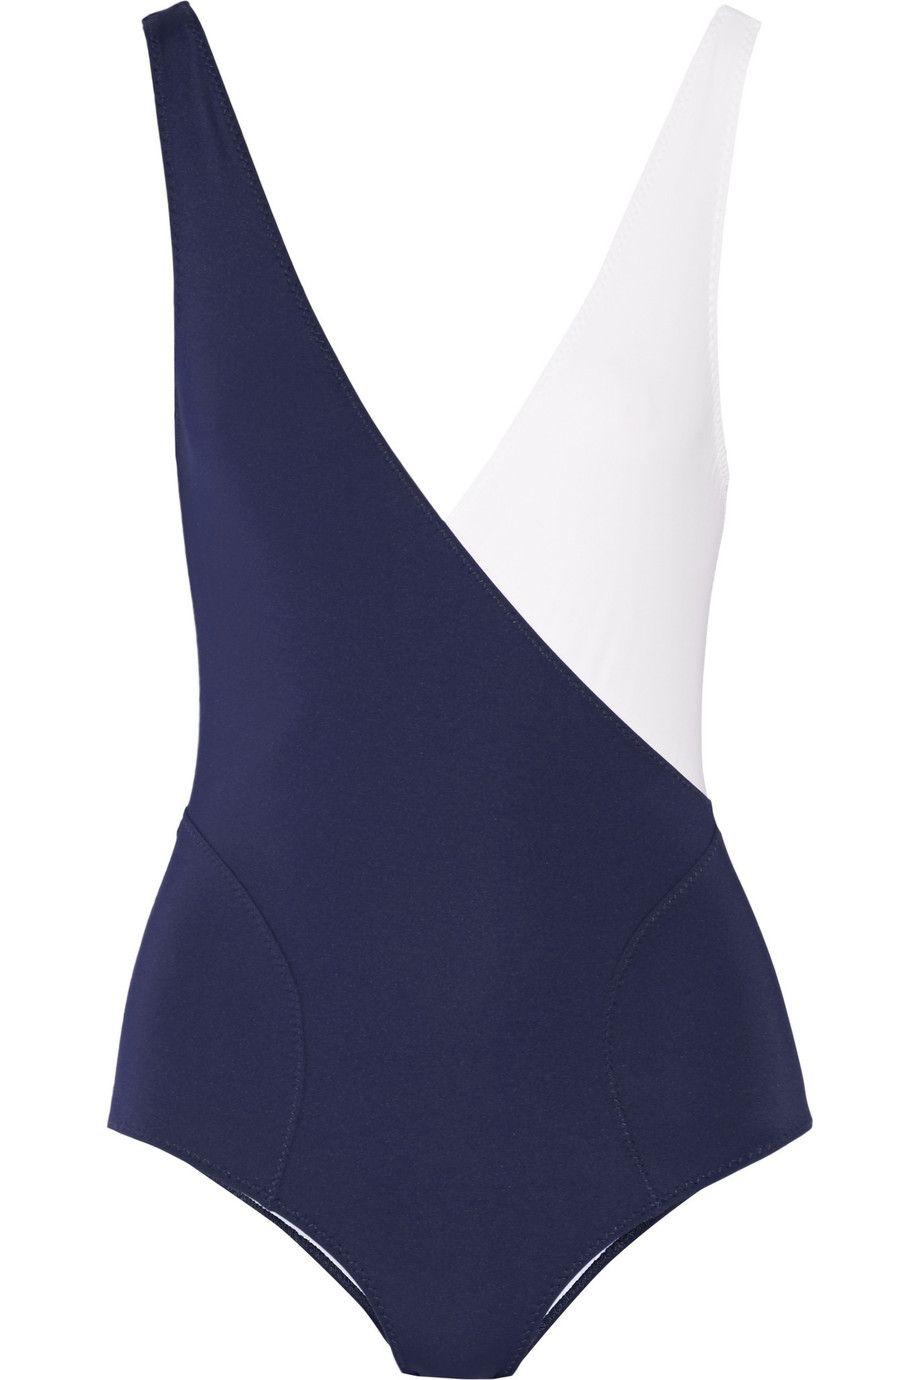 b67996a9e54 We have seven cases against Nora Ephron's bikini quote. Designer Clothes  Sale, Discount Designer